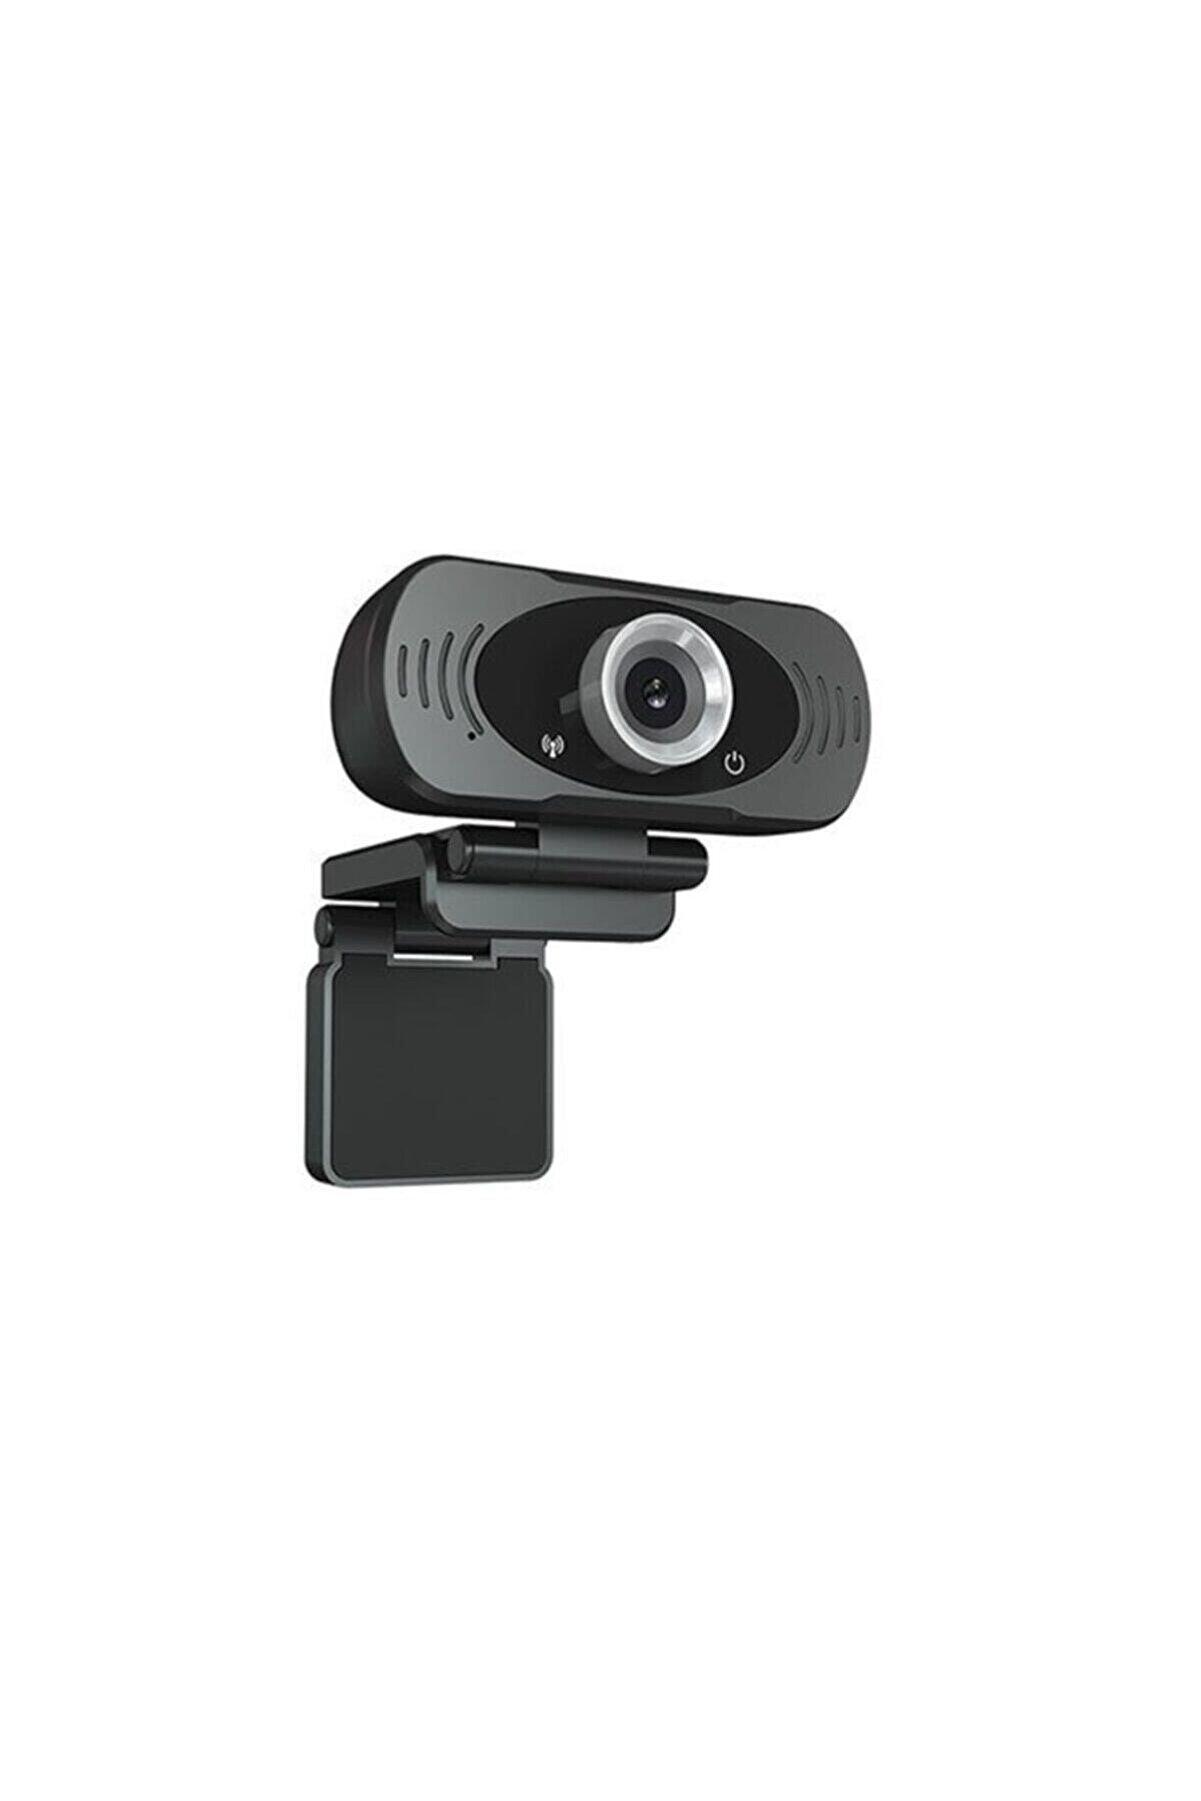 Everest Sc-hd03 1080p Full Hd Webcam Usb Pc Kamera